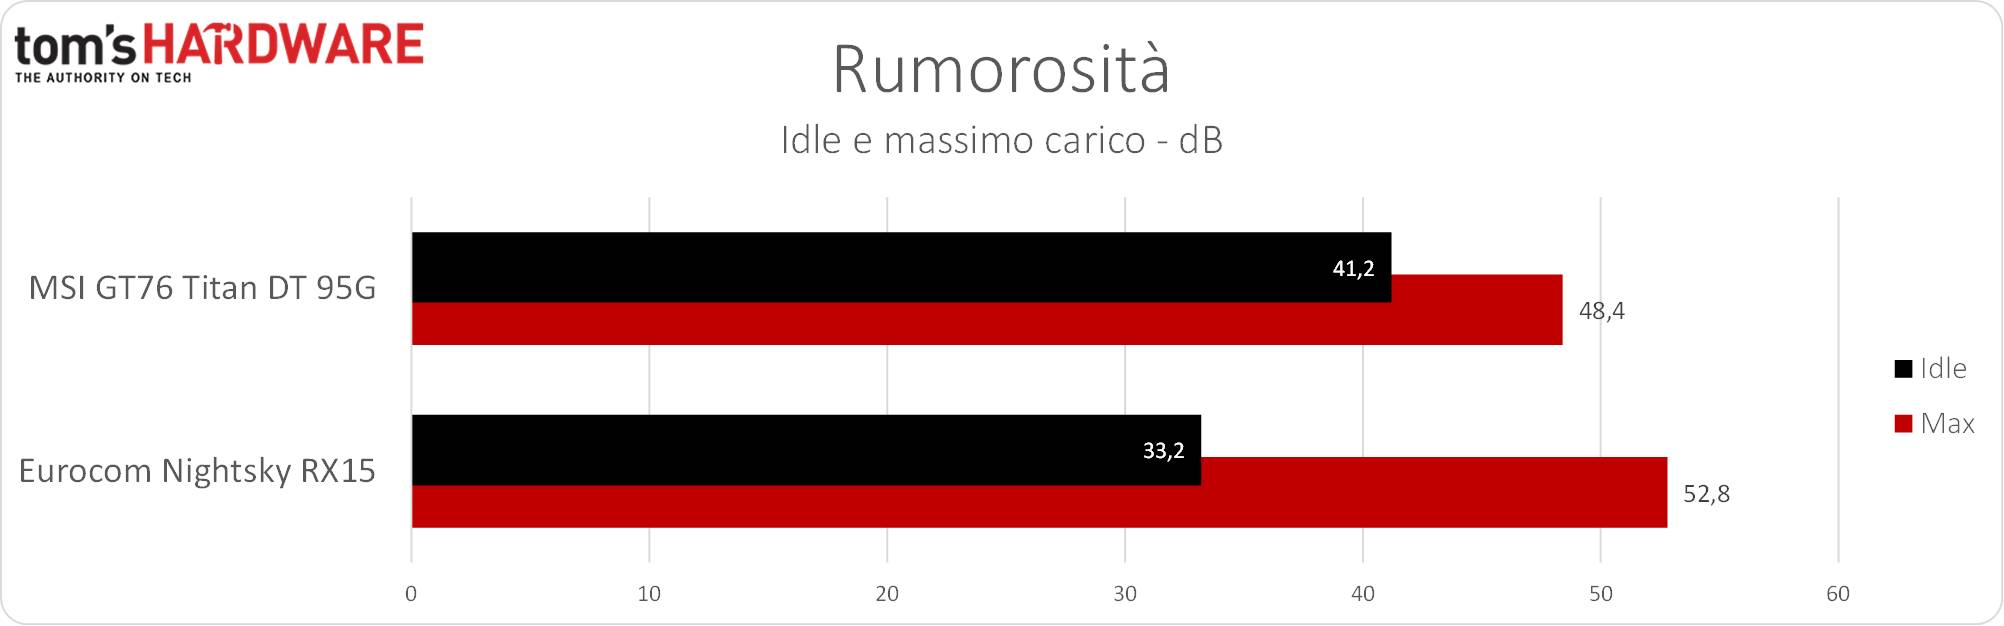 Eurocom Nightsky RX15 - Rumorosità